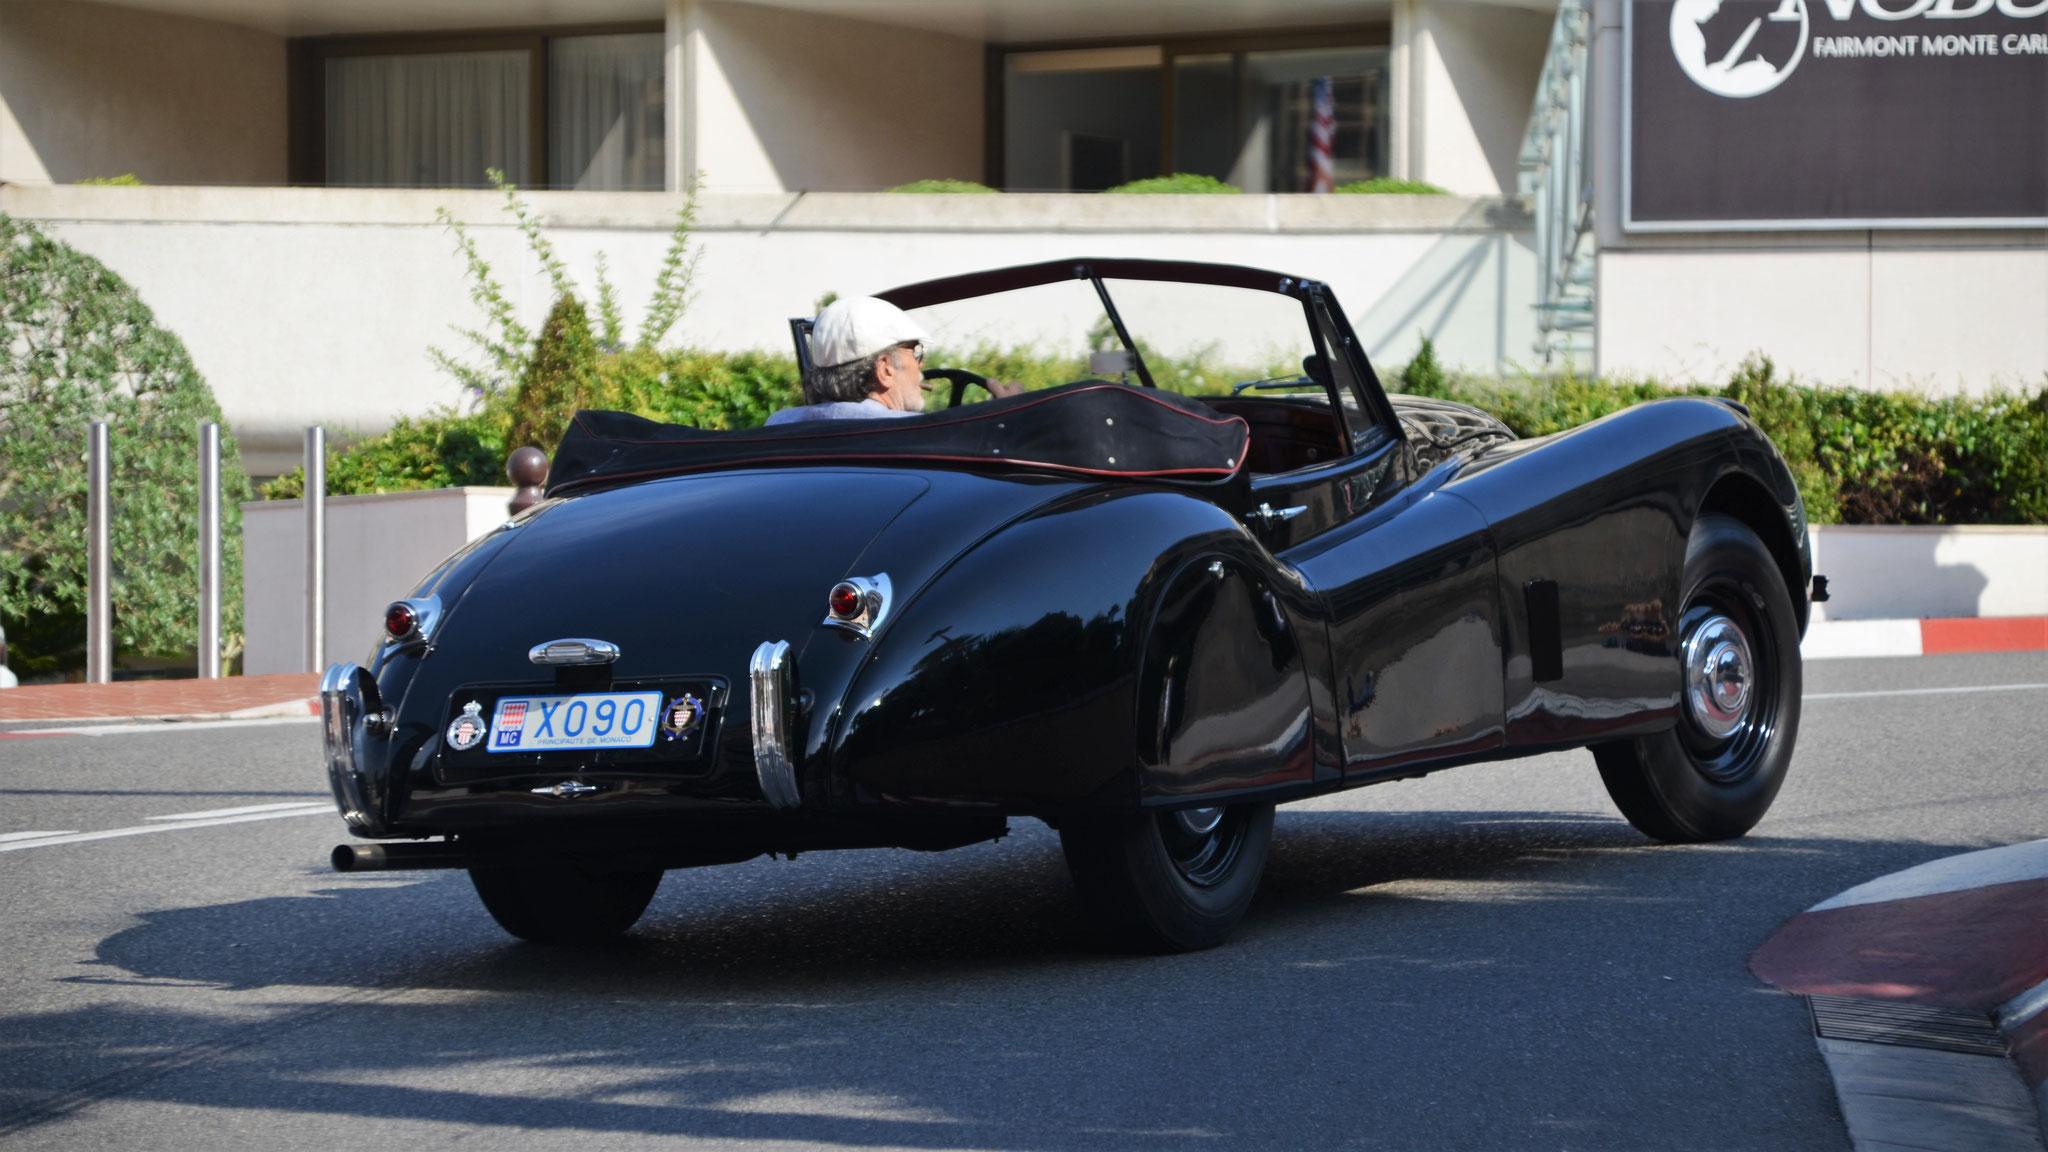 Jaguar XK 120 Cabrio - X090 (MC)